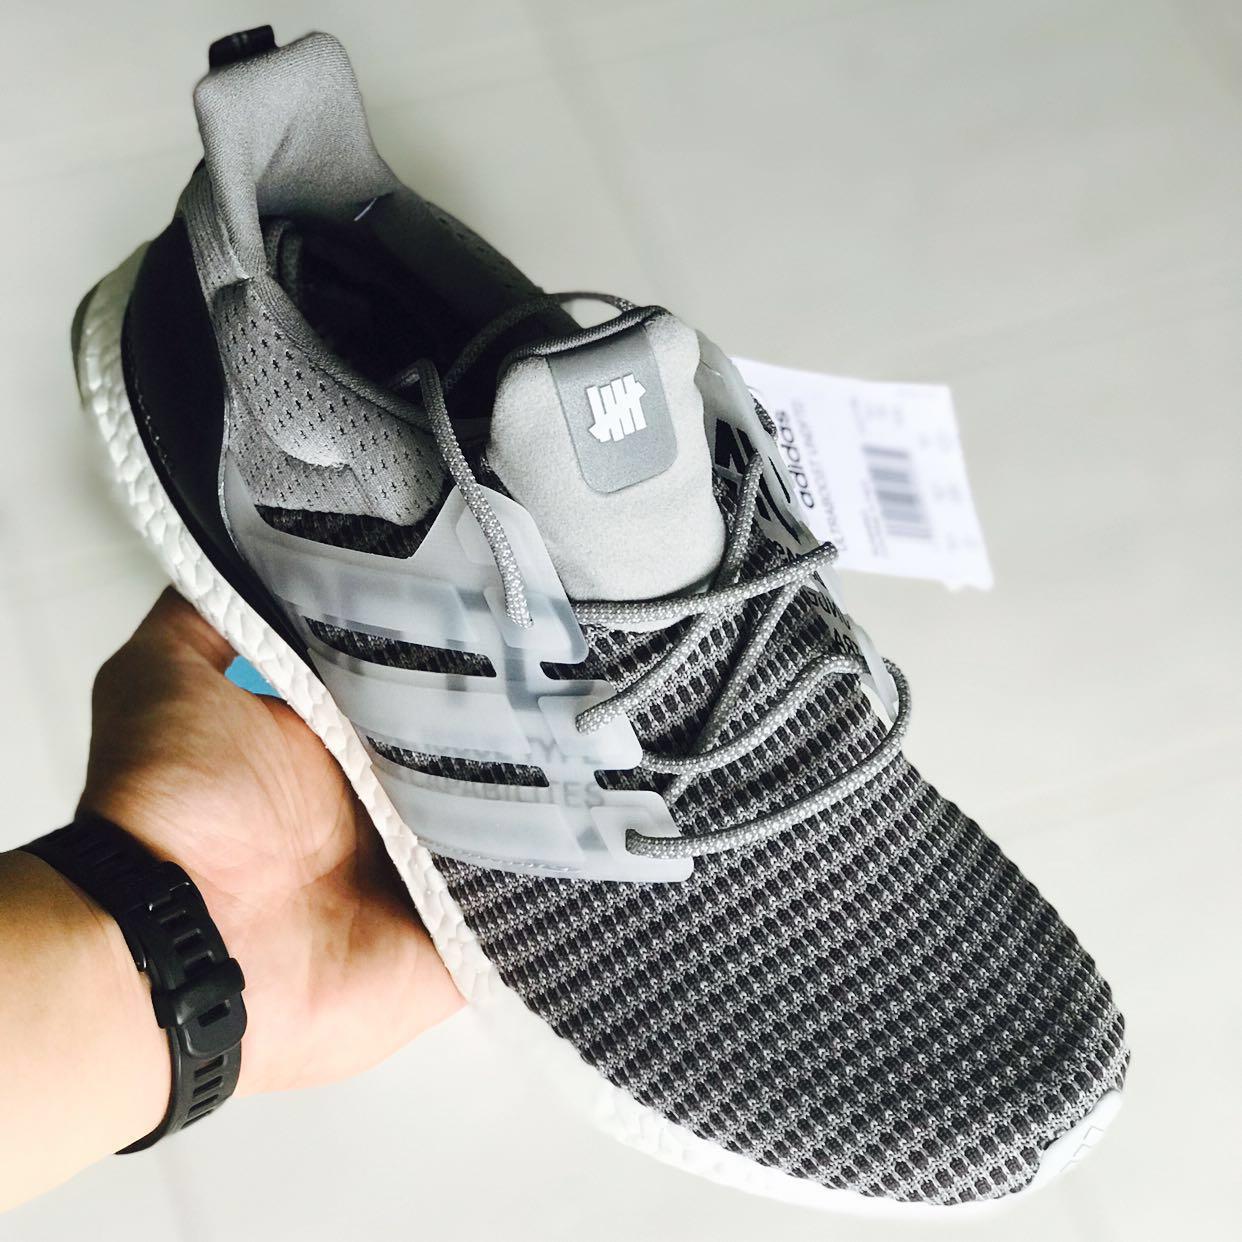 8eb79b82b1f Undefeated x Adidas Ultraboost  UK9.5